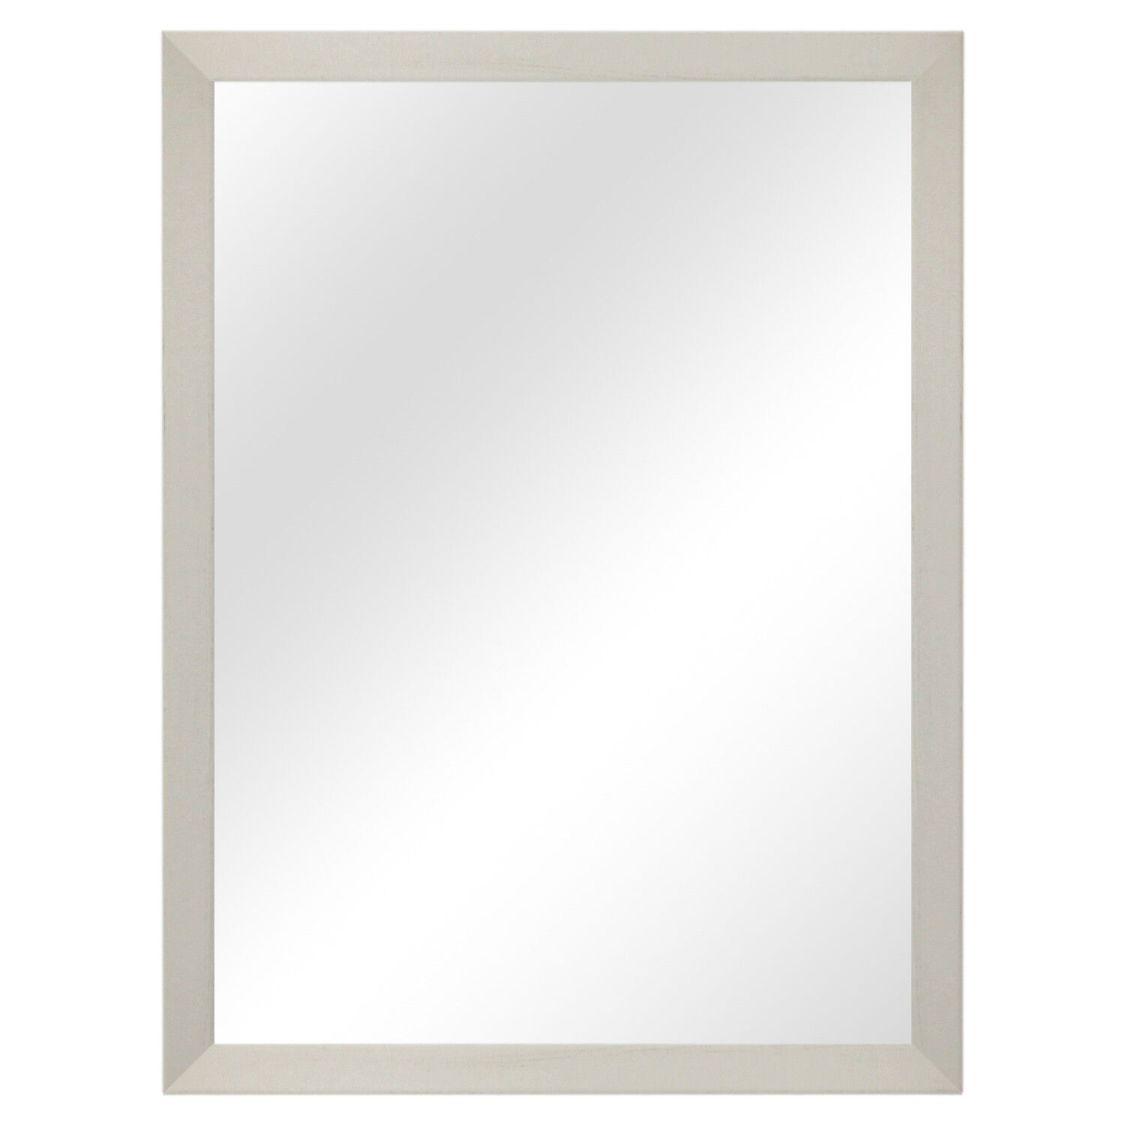 Wandspiegel 56,5x76,5cm Flurspiegel Garderobenspiegel Holz Frisierspiegel Weiß